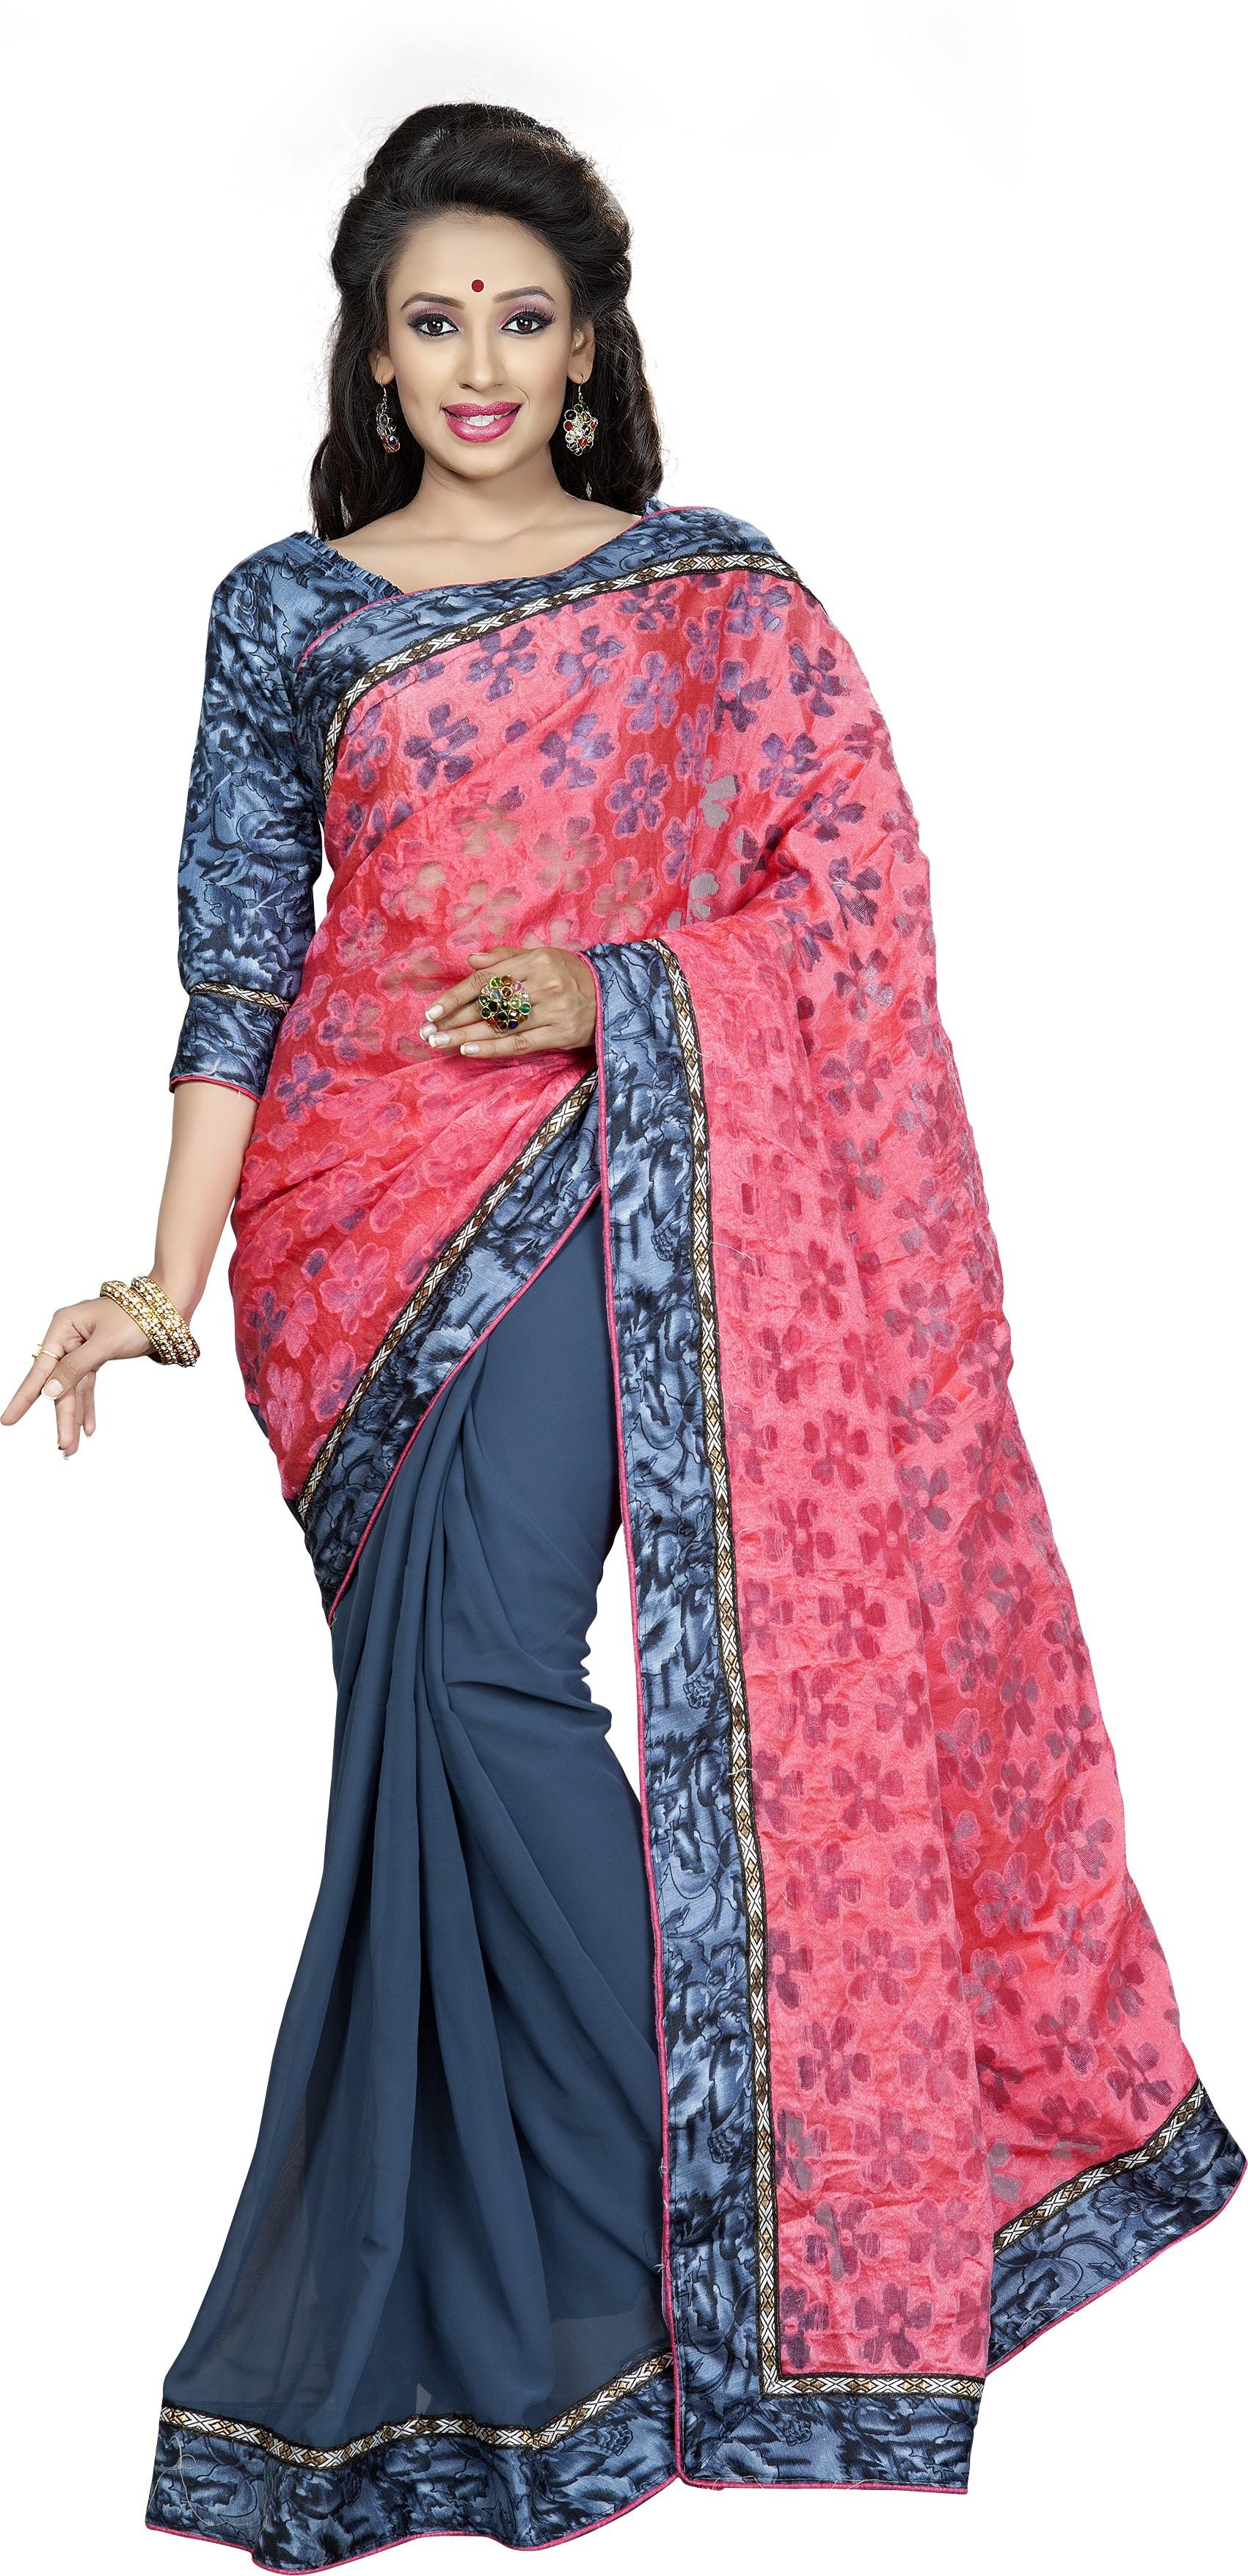 Deals - Womens Clothing Dresses, Sarees & more